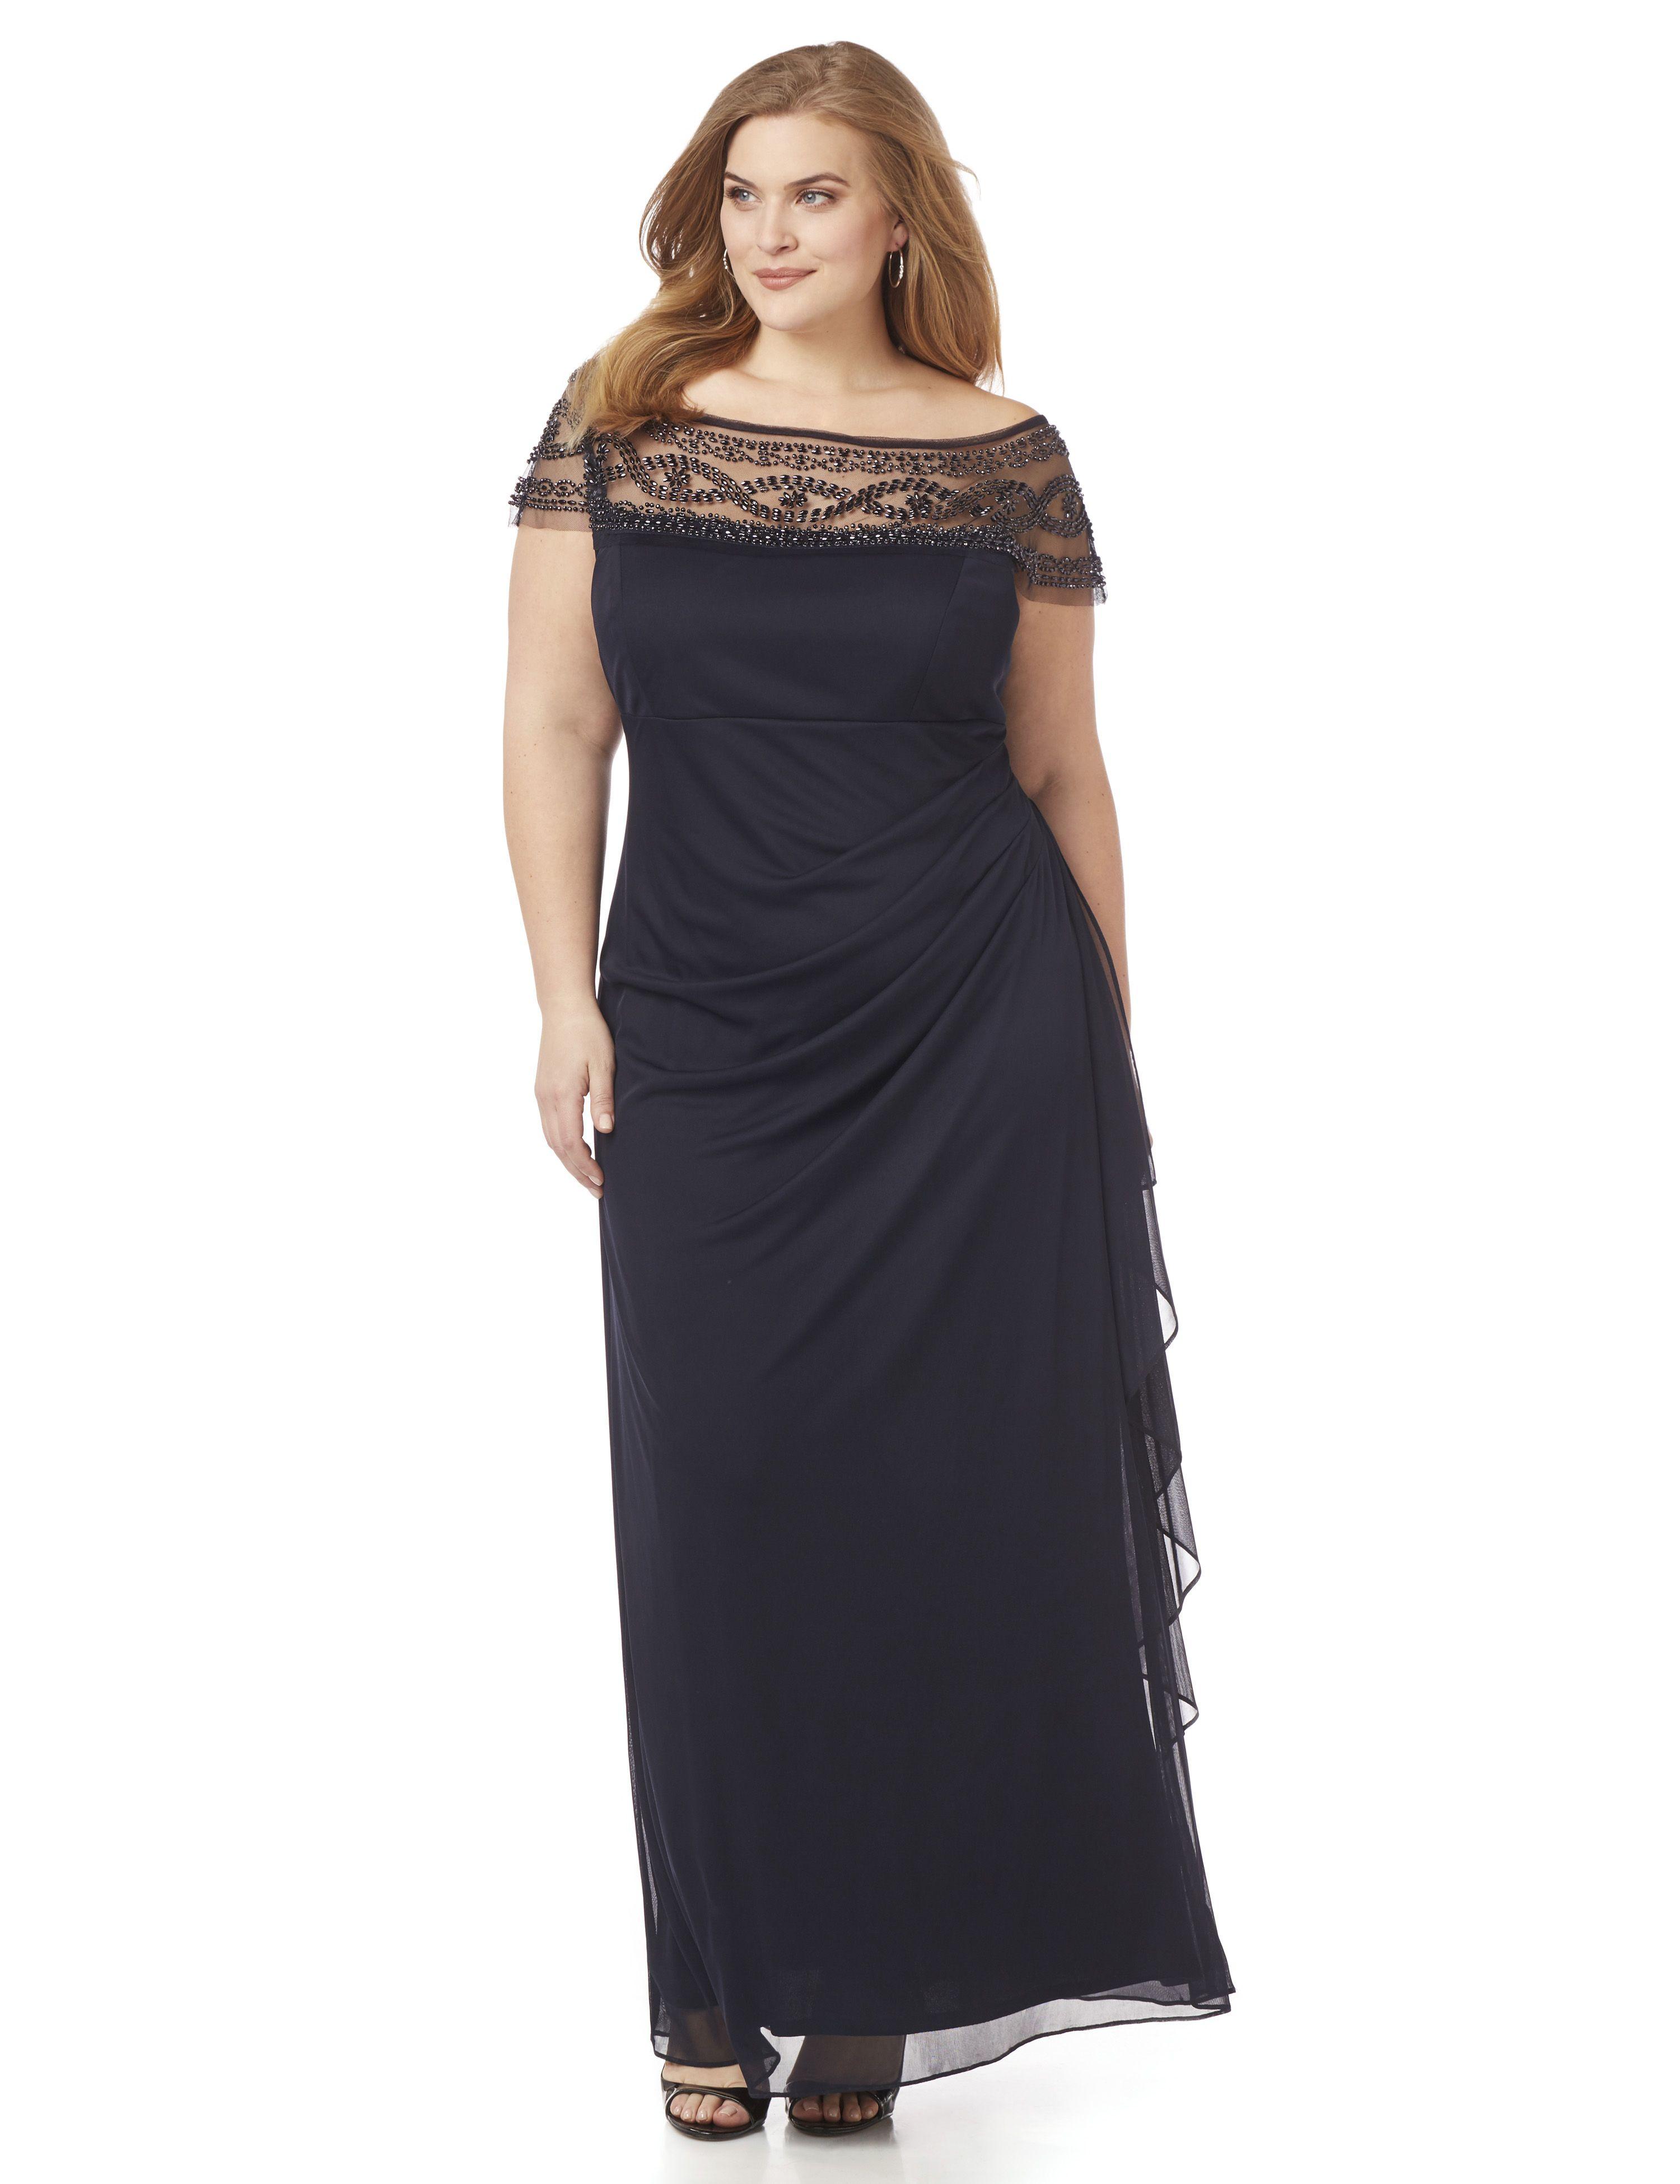 Lane bryant plus size prom dresses - Best Dressed